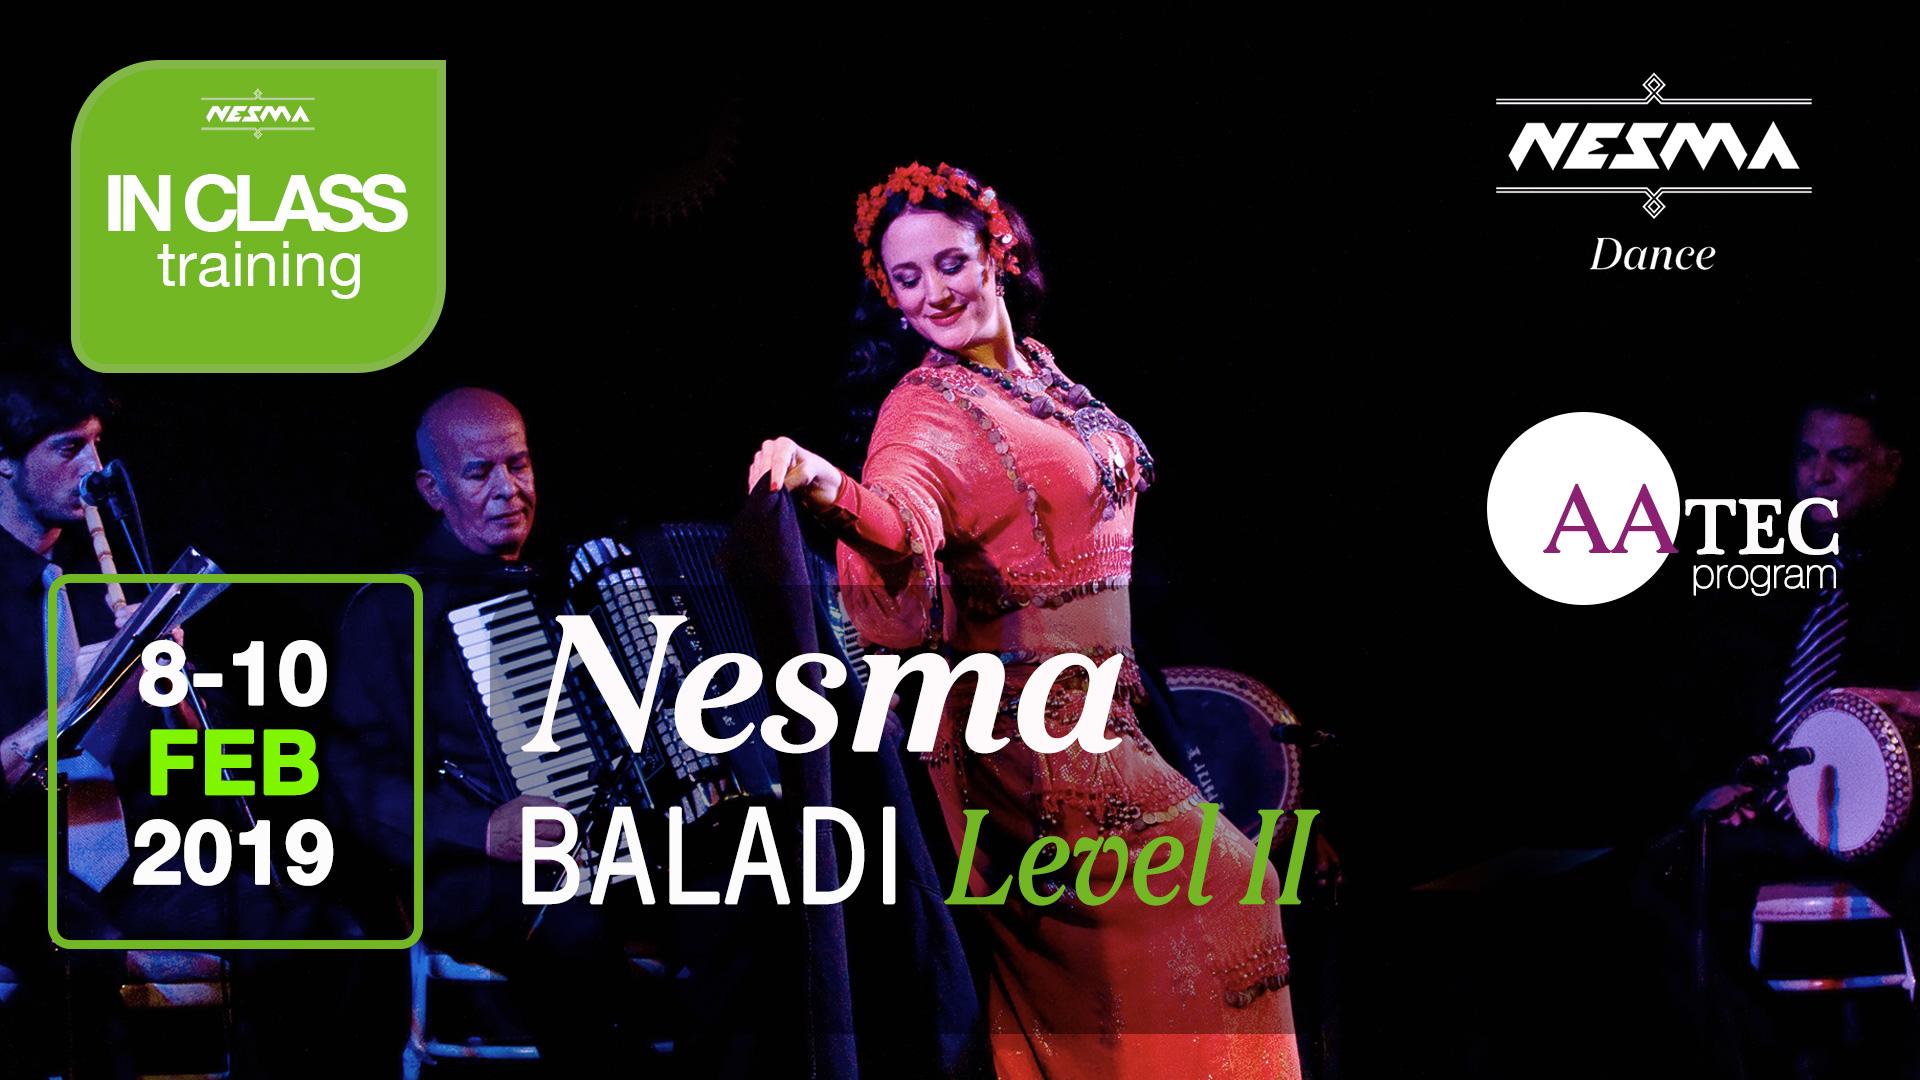 Nesma Baladi course level 2 AATEC Program